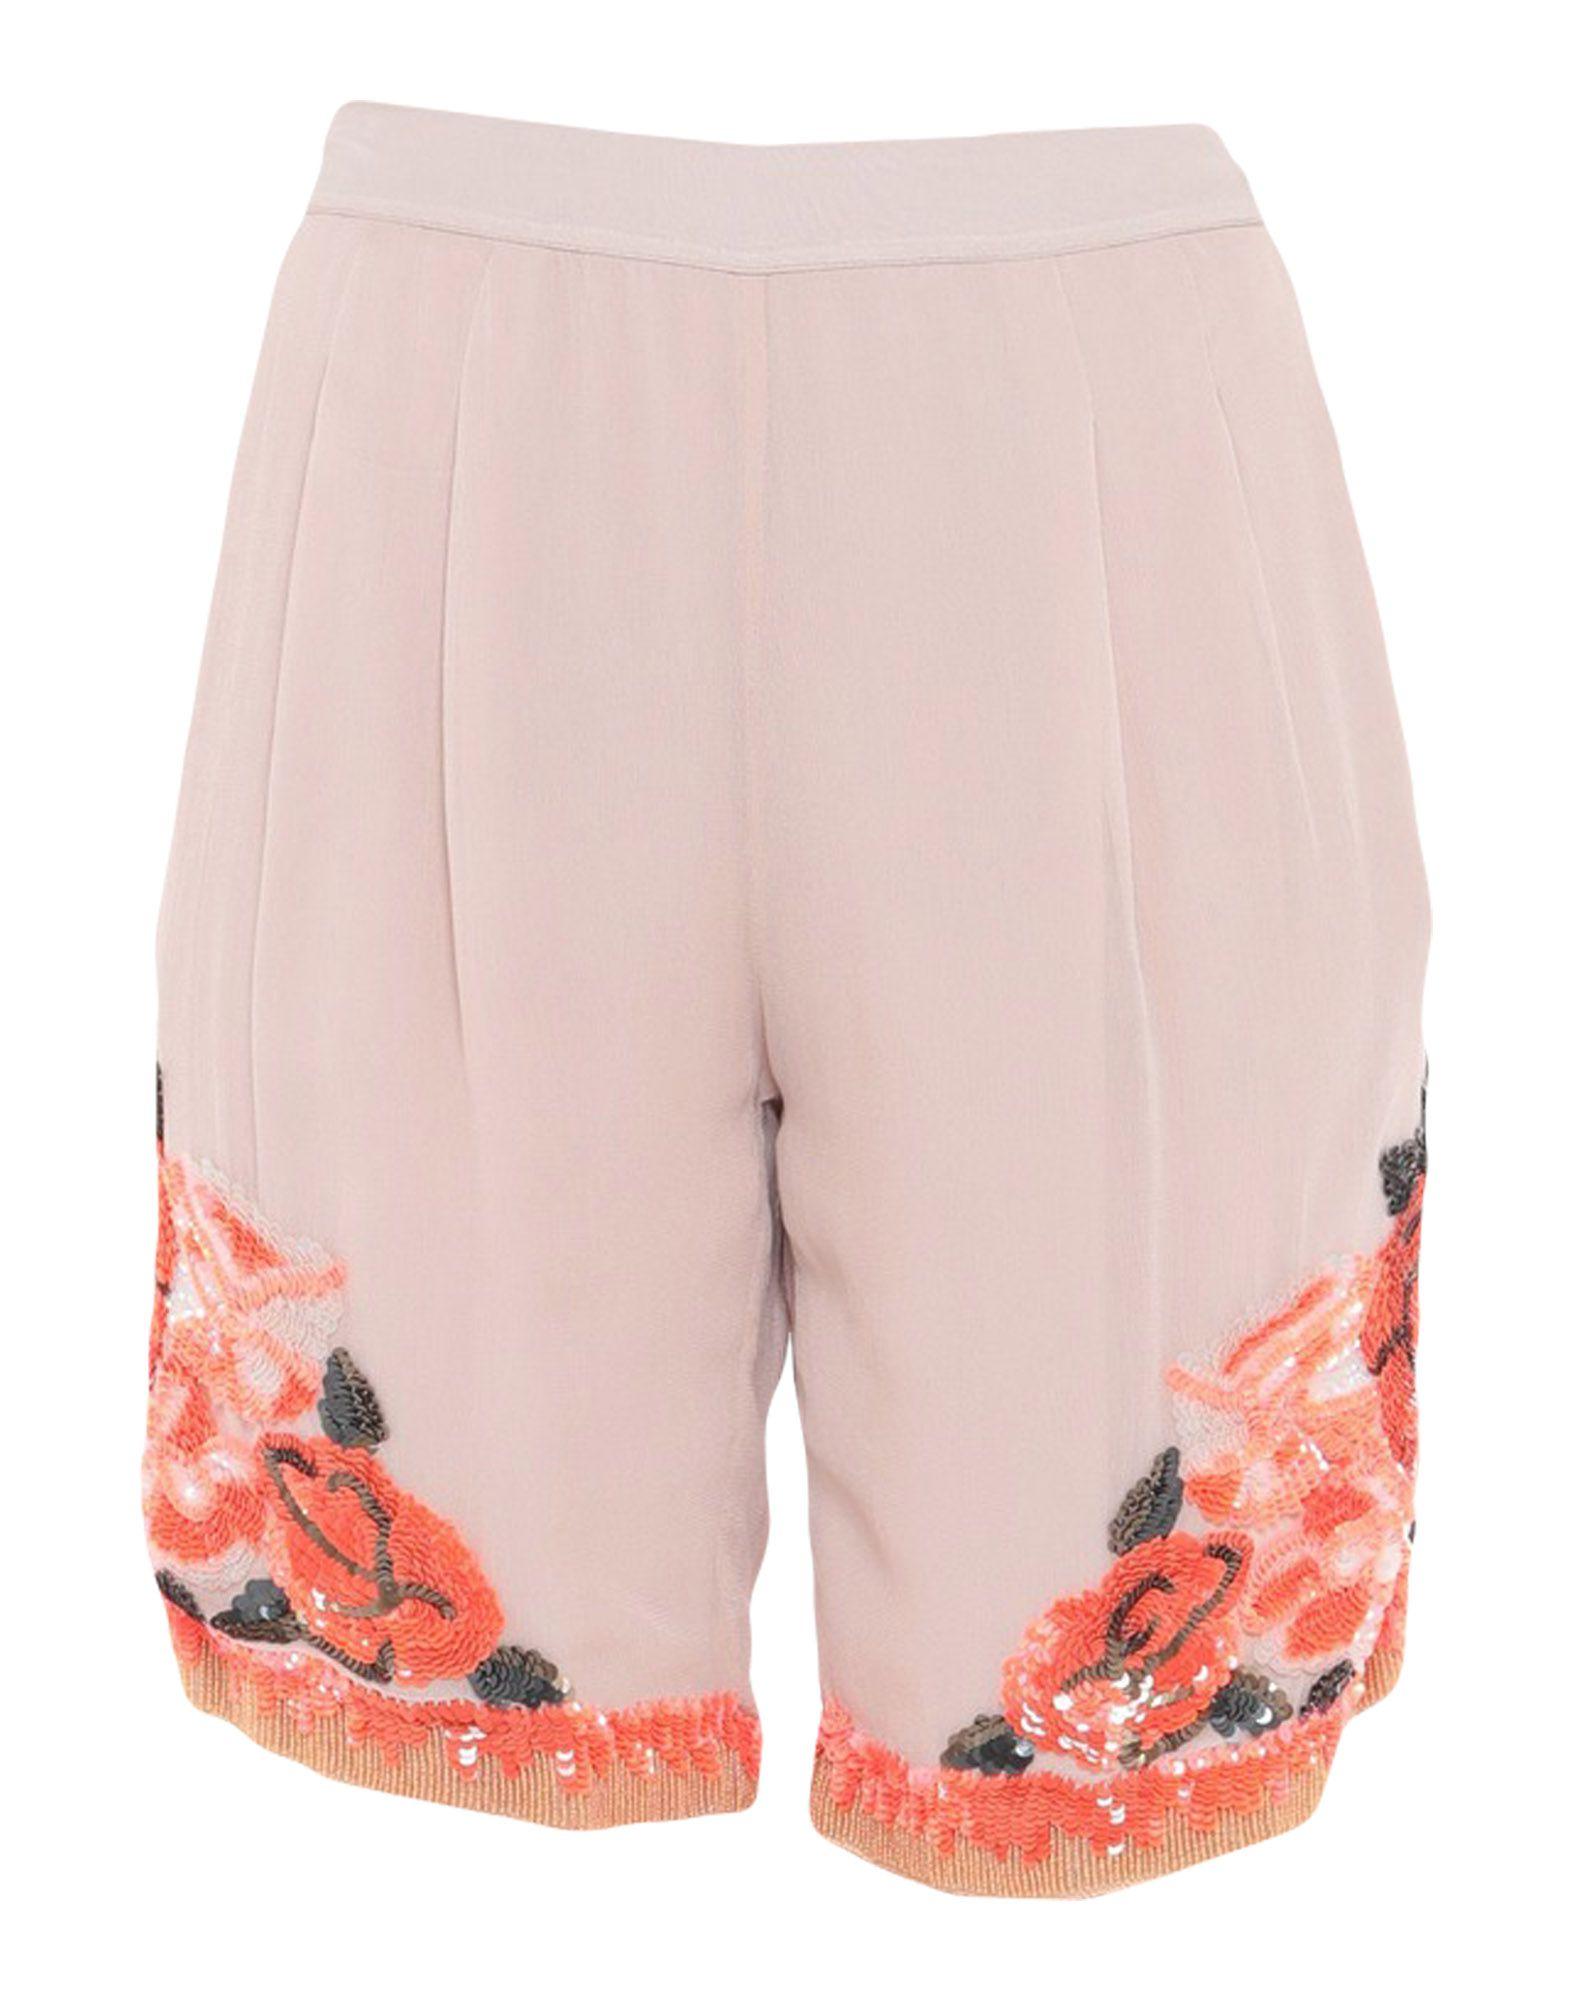 TWIN-SET Simona Barbieri Пляжные брюки и шорты twin set simona barbieri пляжные брюки и шорты